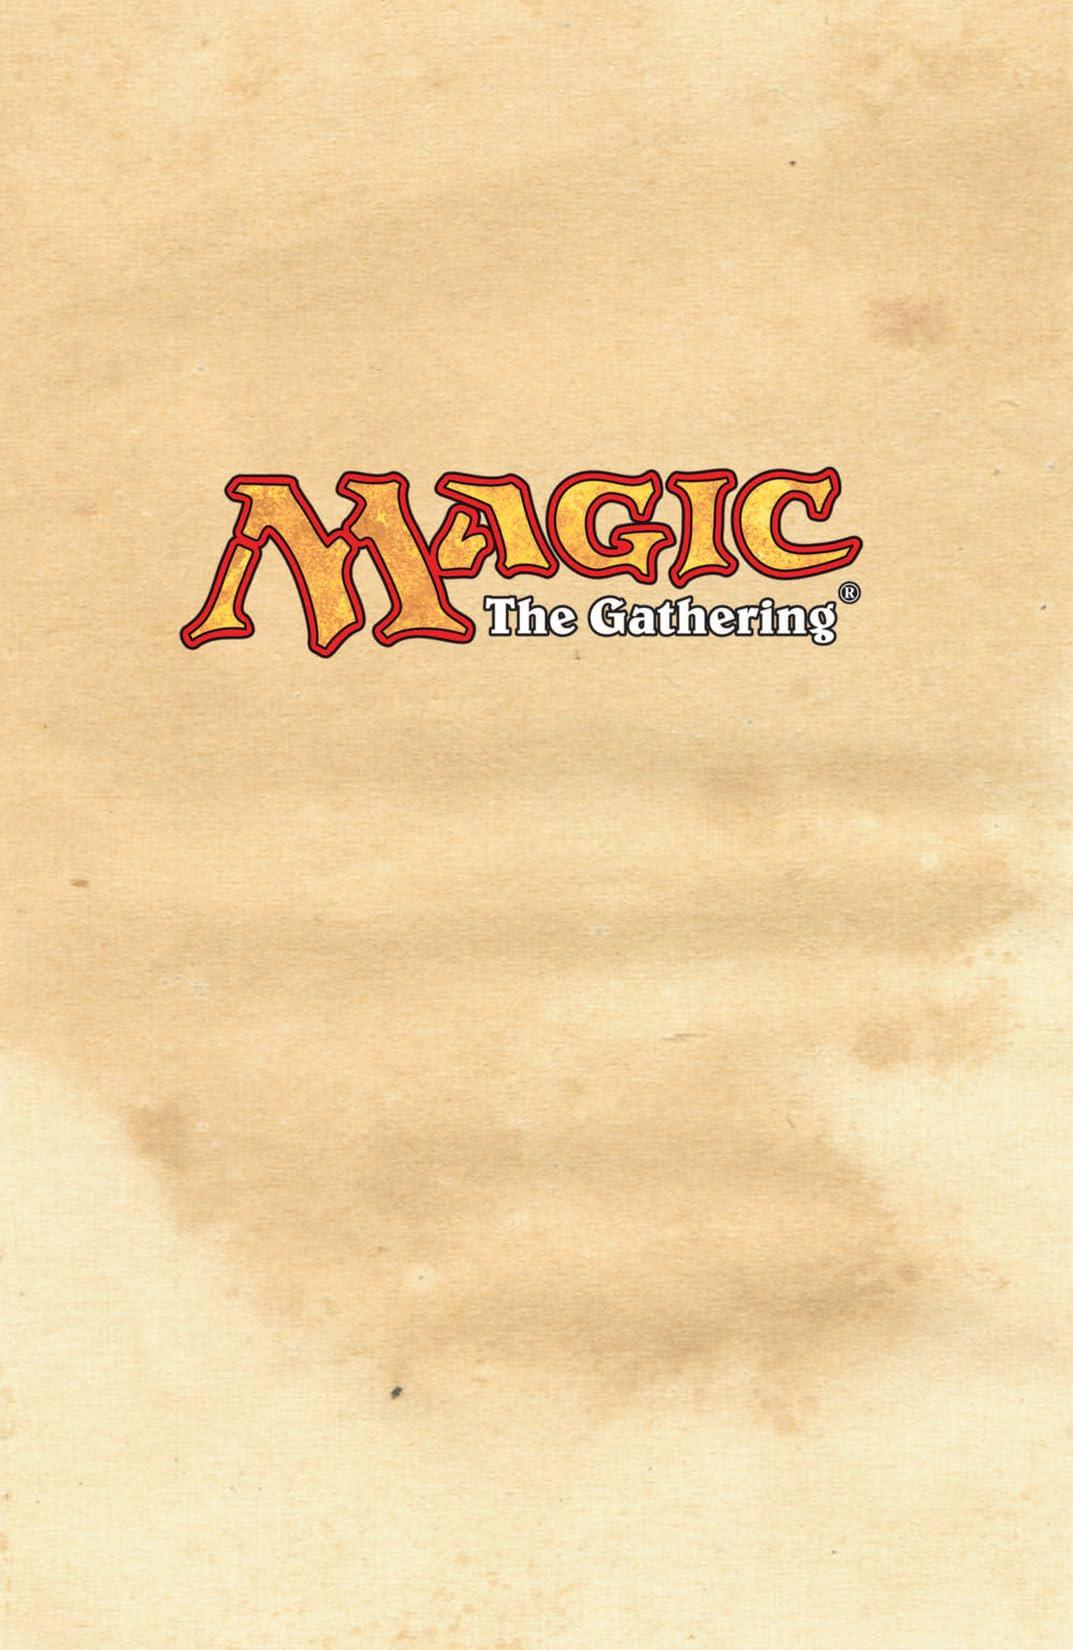 Magic the Gathering Vol. 1